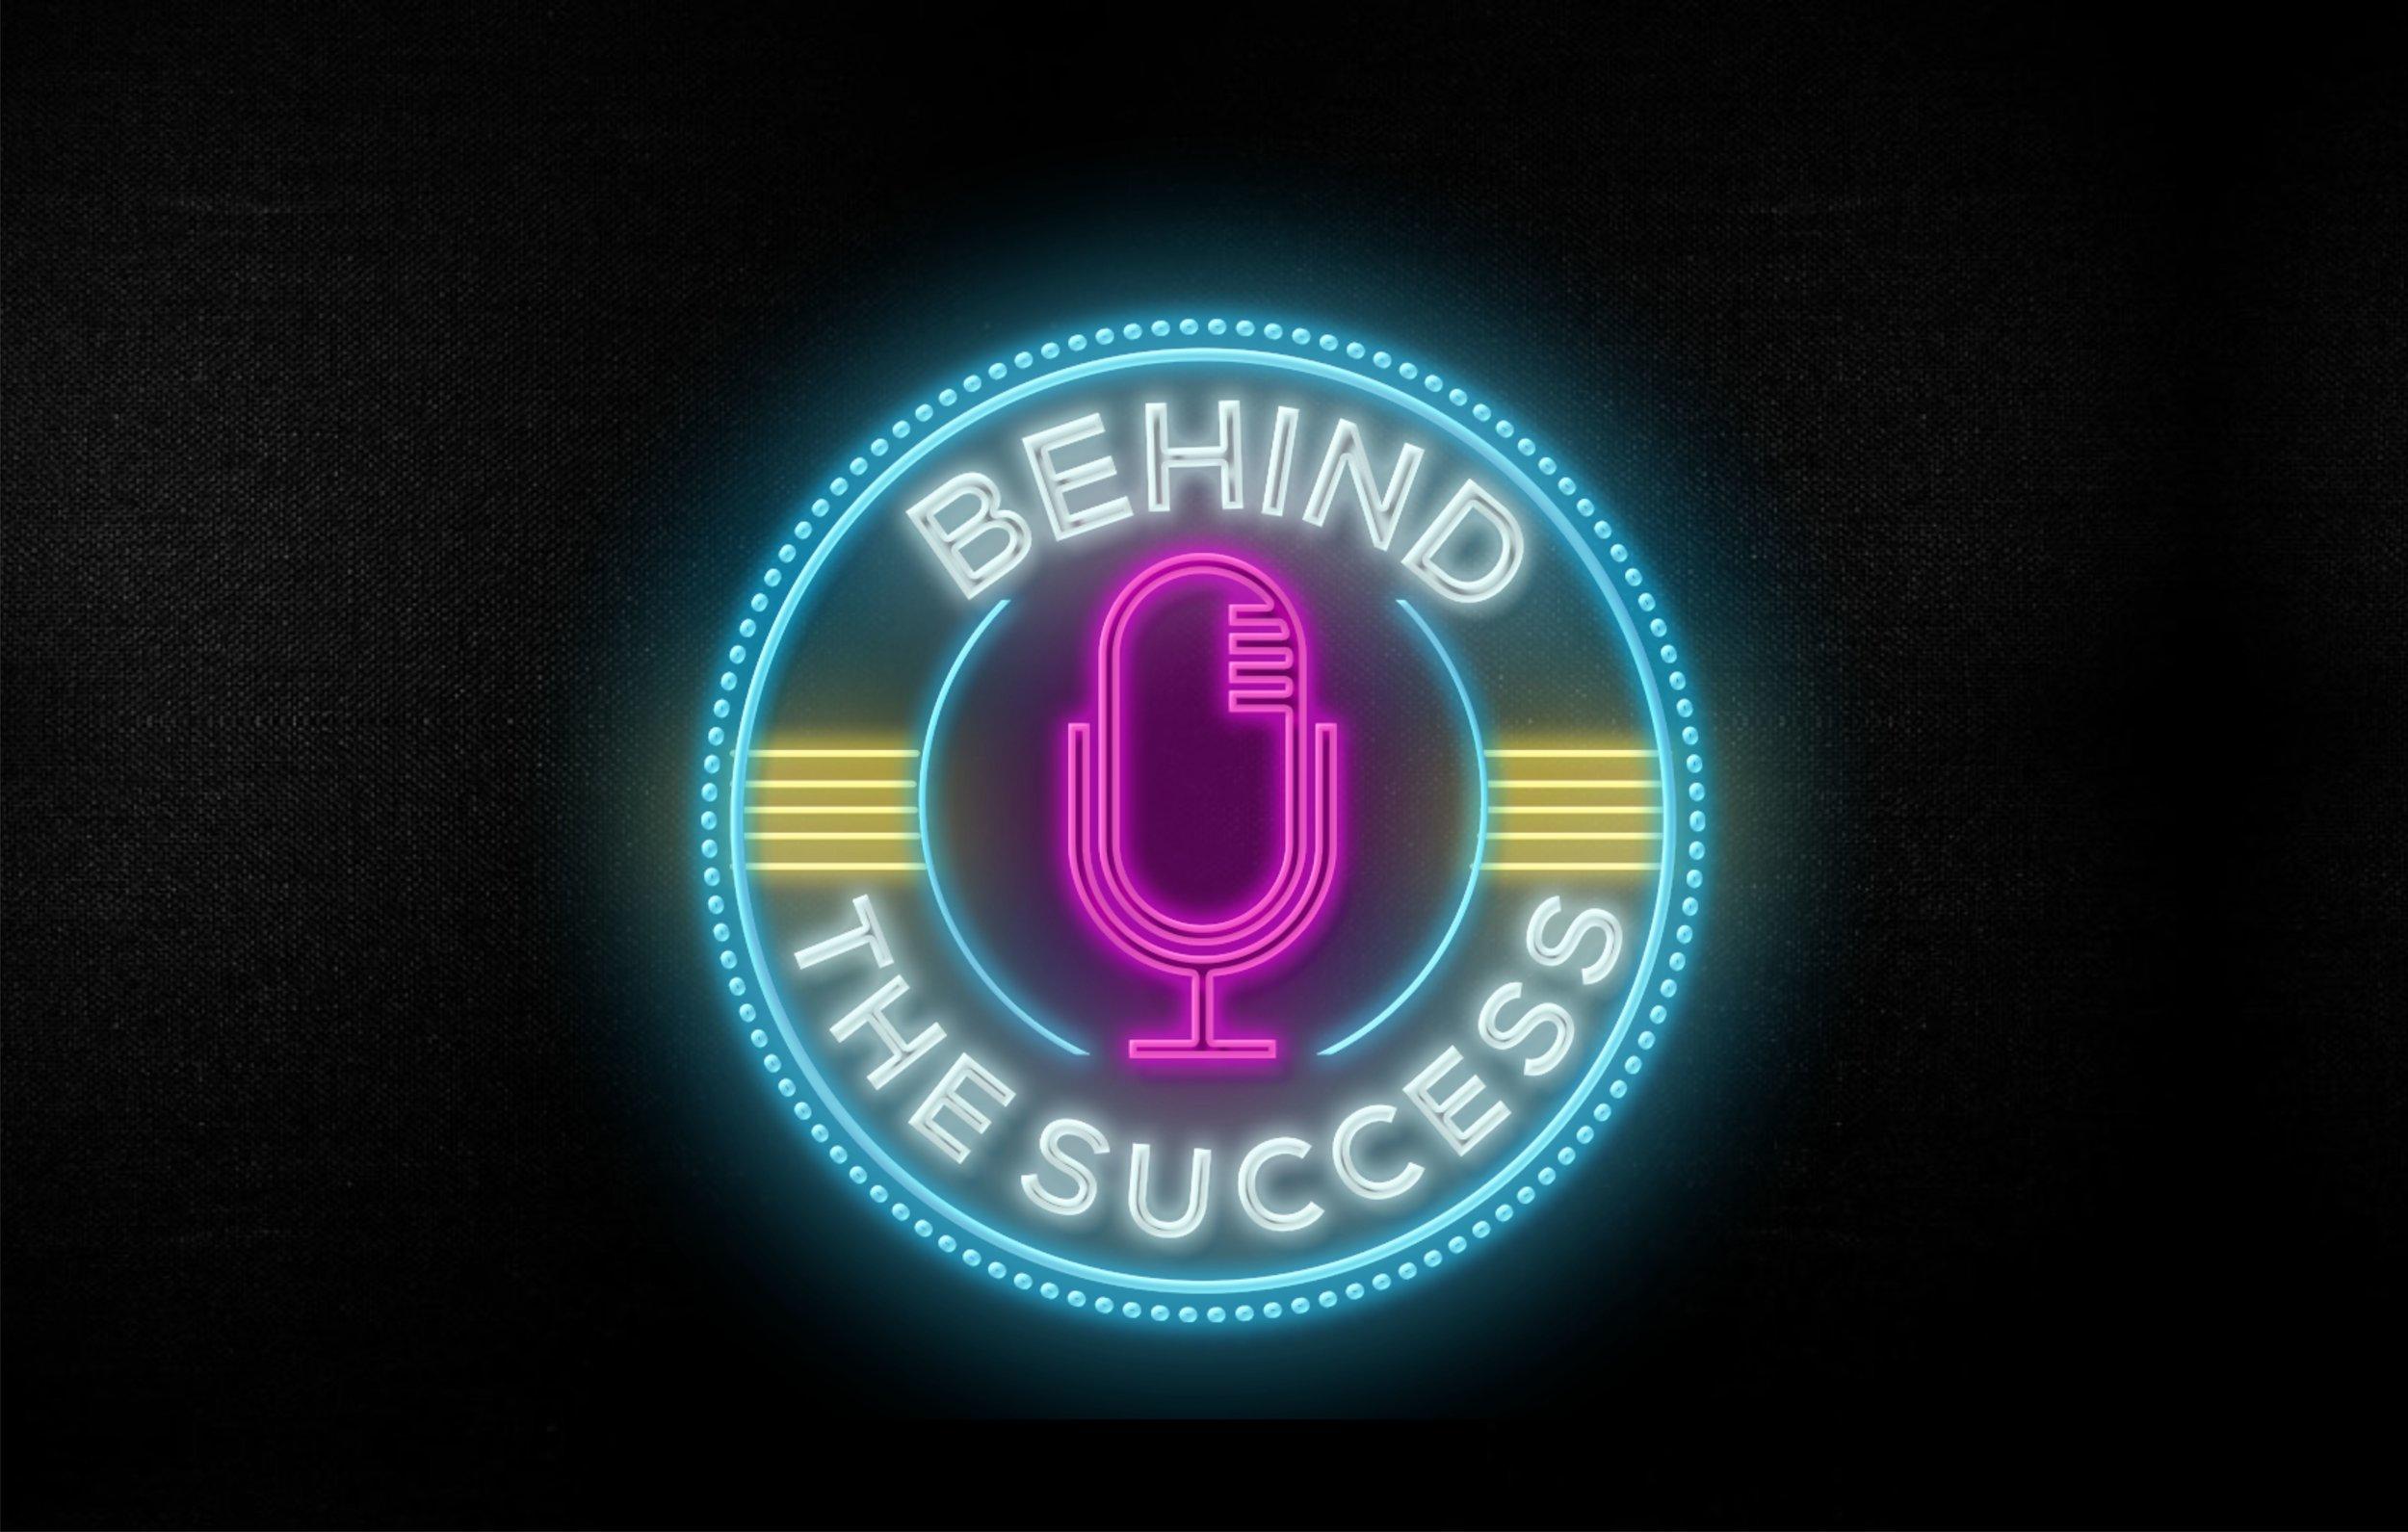 Behind The Success Logo.jpg